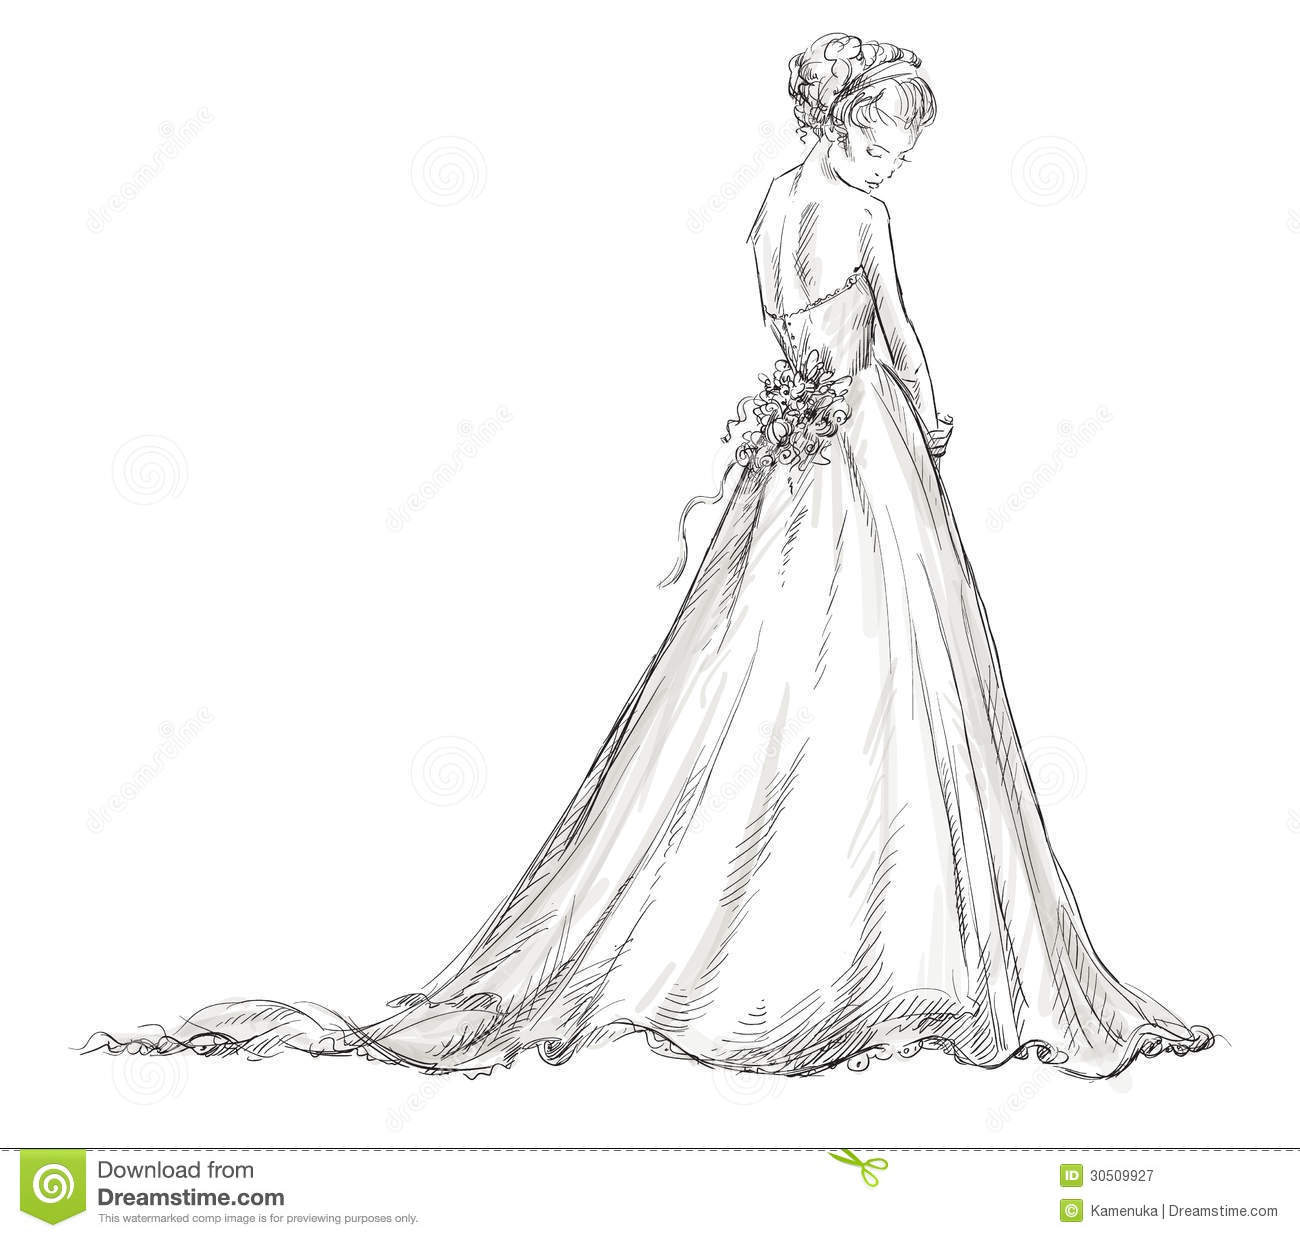 Women in wedding dress clipart.